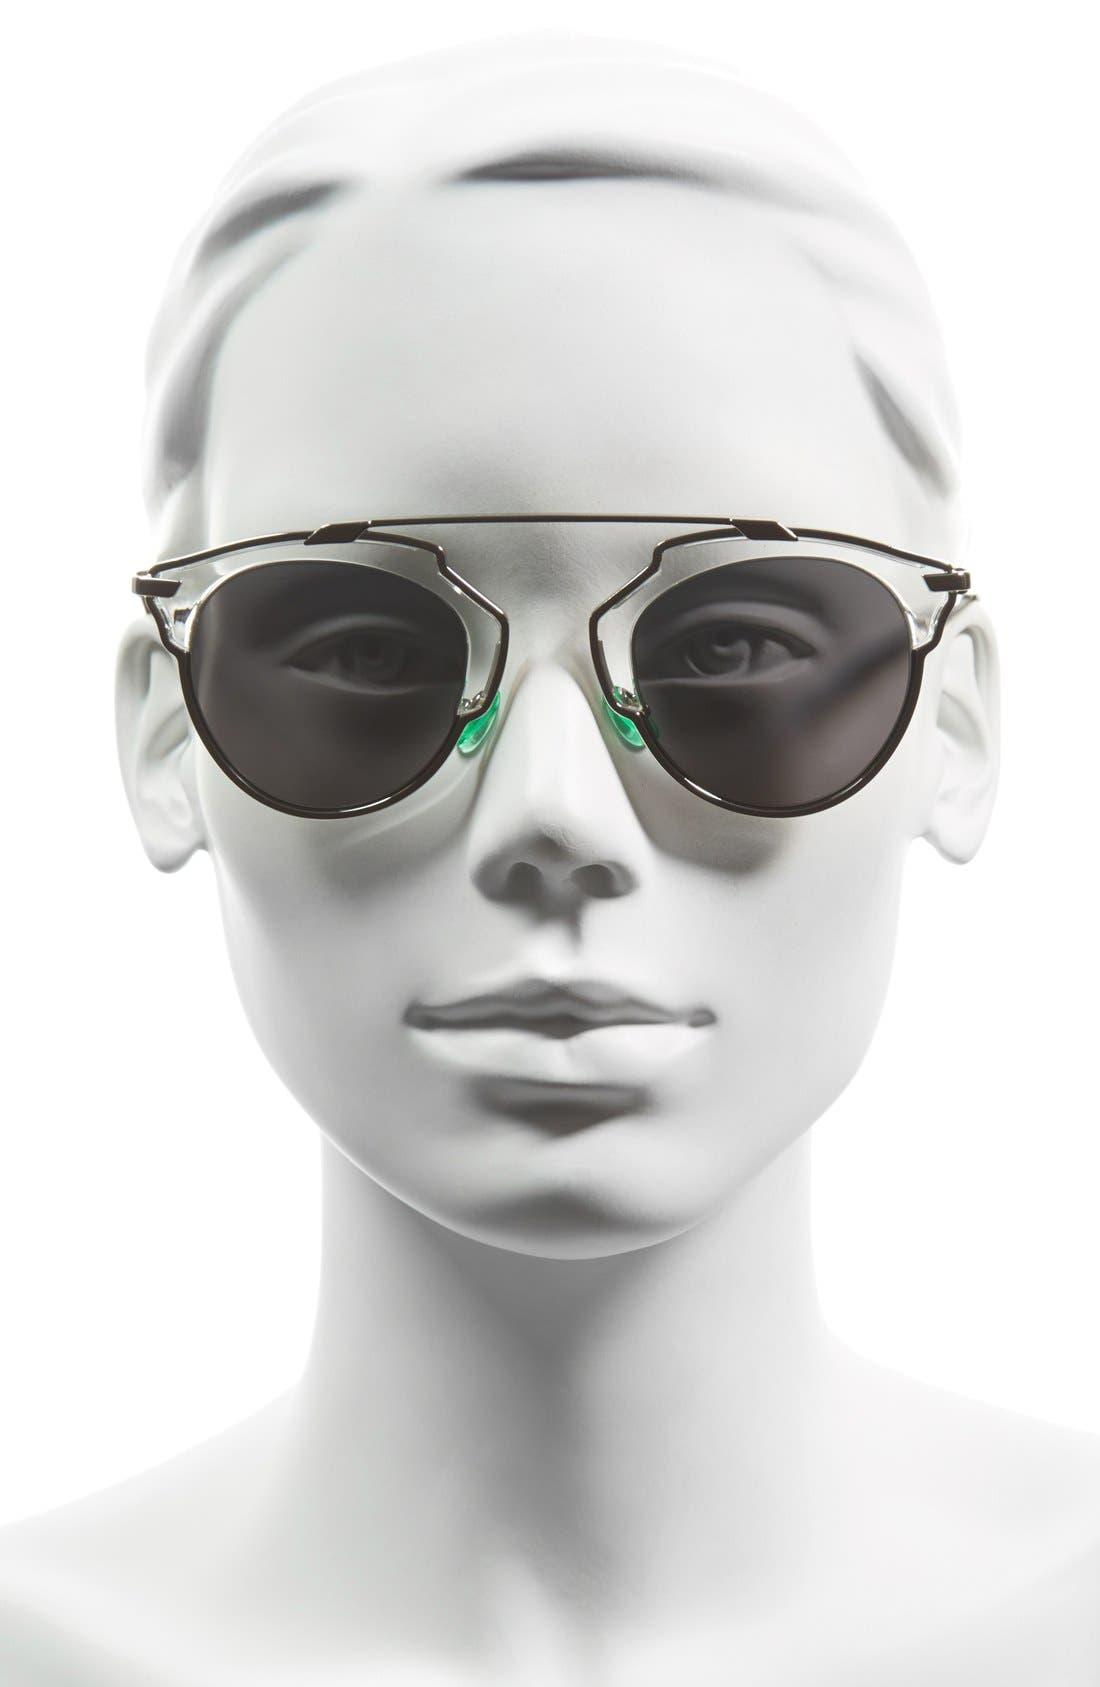 So Real 48mm Brow Bar Sunglasses,                             Alternate thumbnail 33, color,